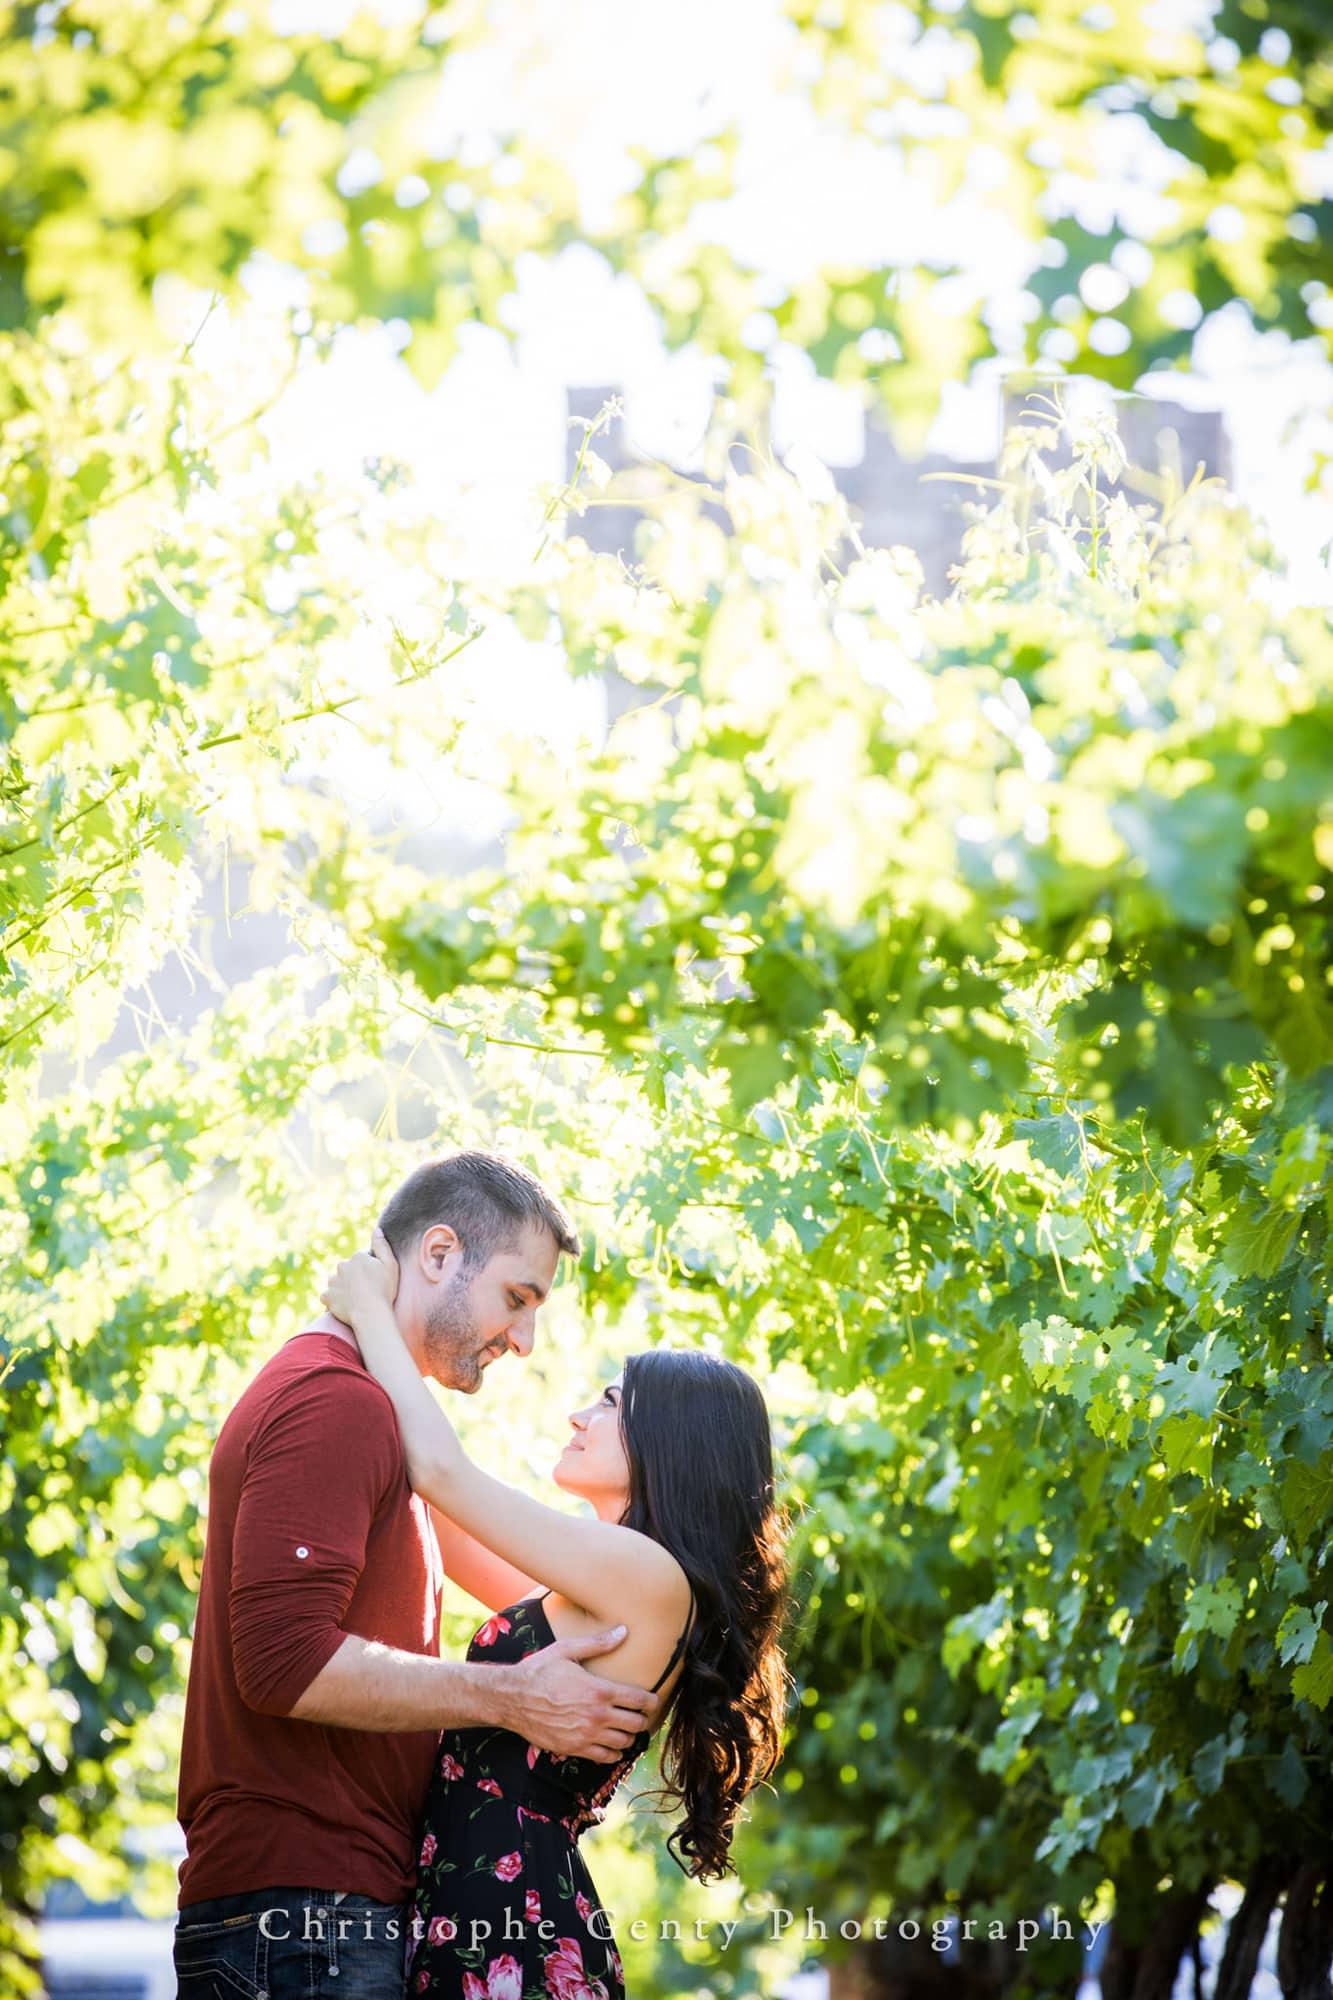 Castello di Amorosa Marriage Proposal Photography 354